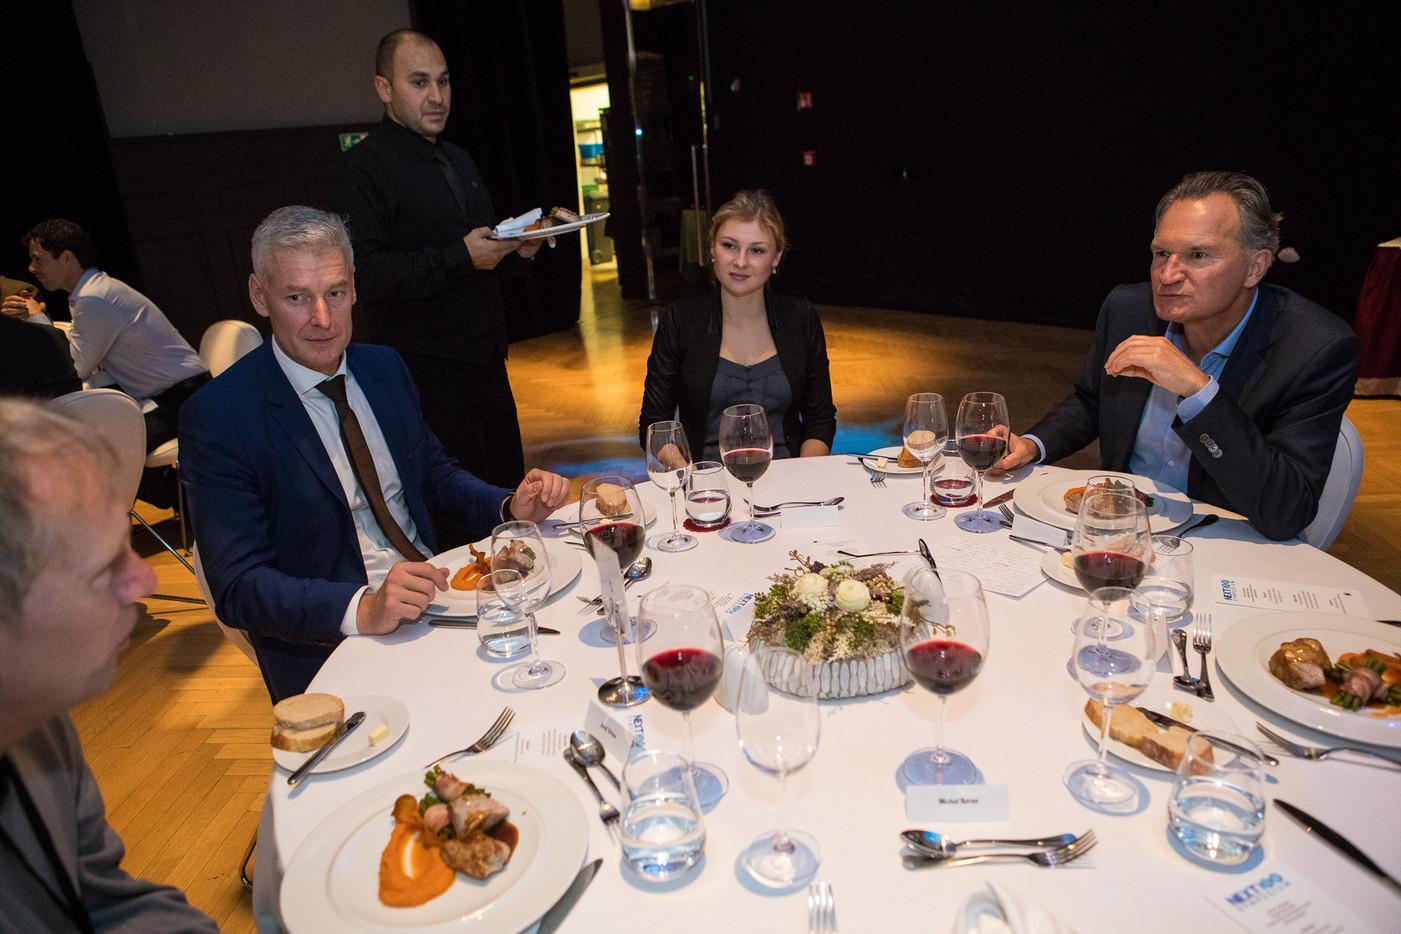 Milan Slapak, Odessa Primus, Robert-Jan